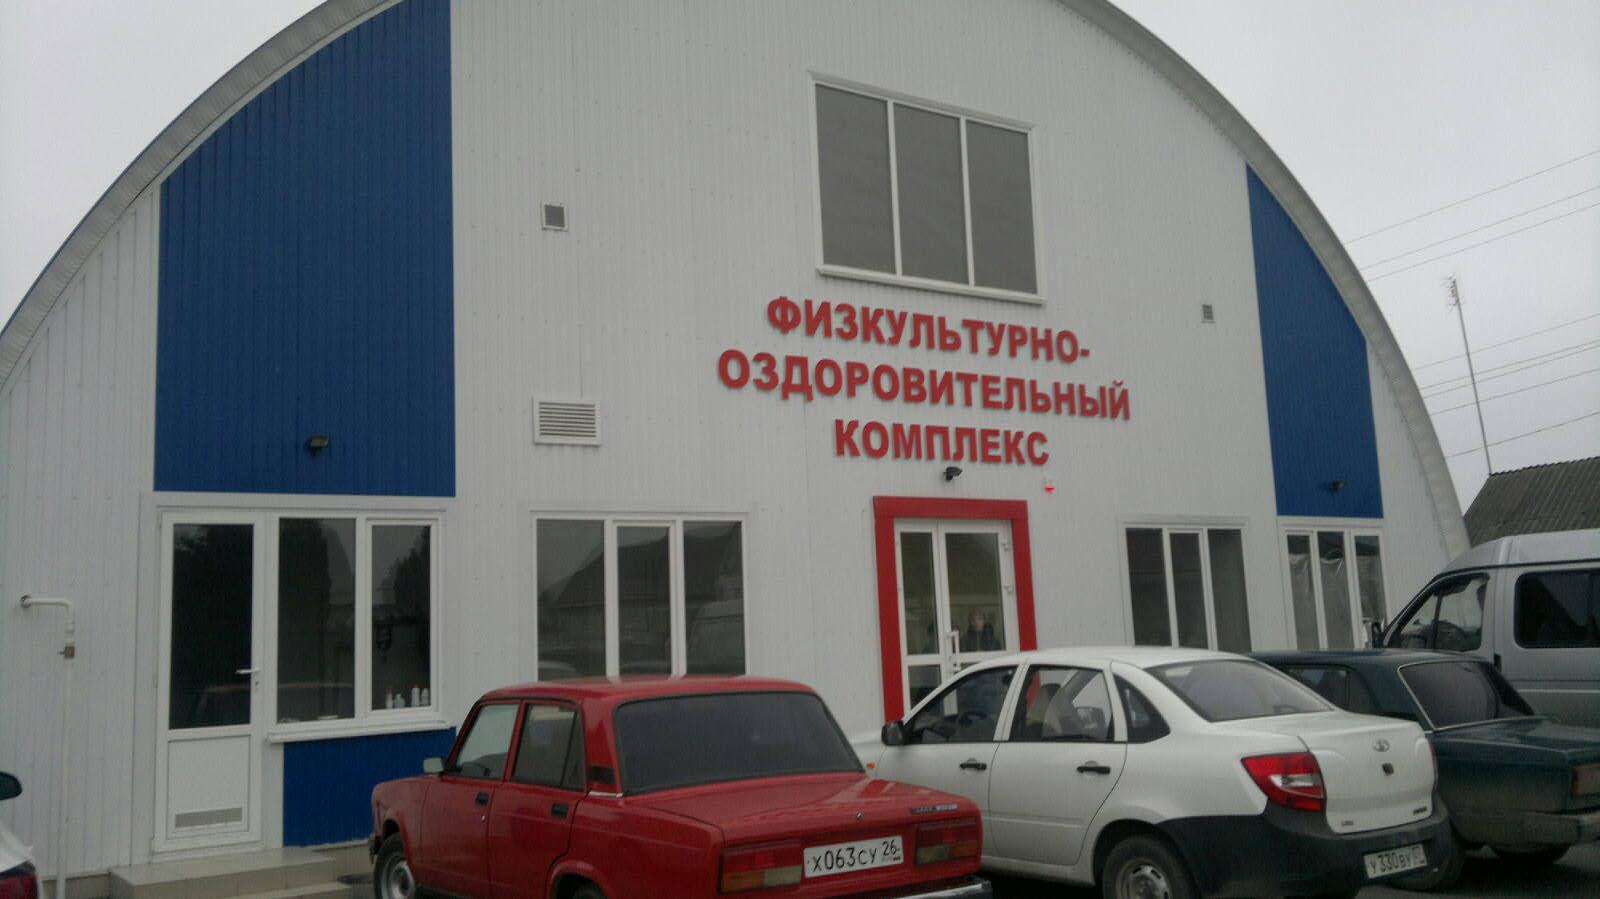 C:\Documents and Settings\Admin\Рабочий стол\16022015155.jpg